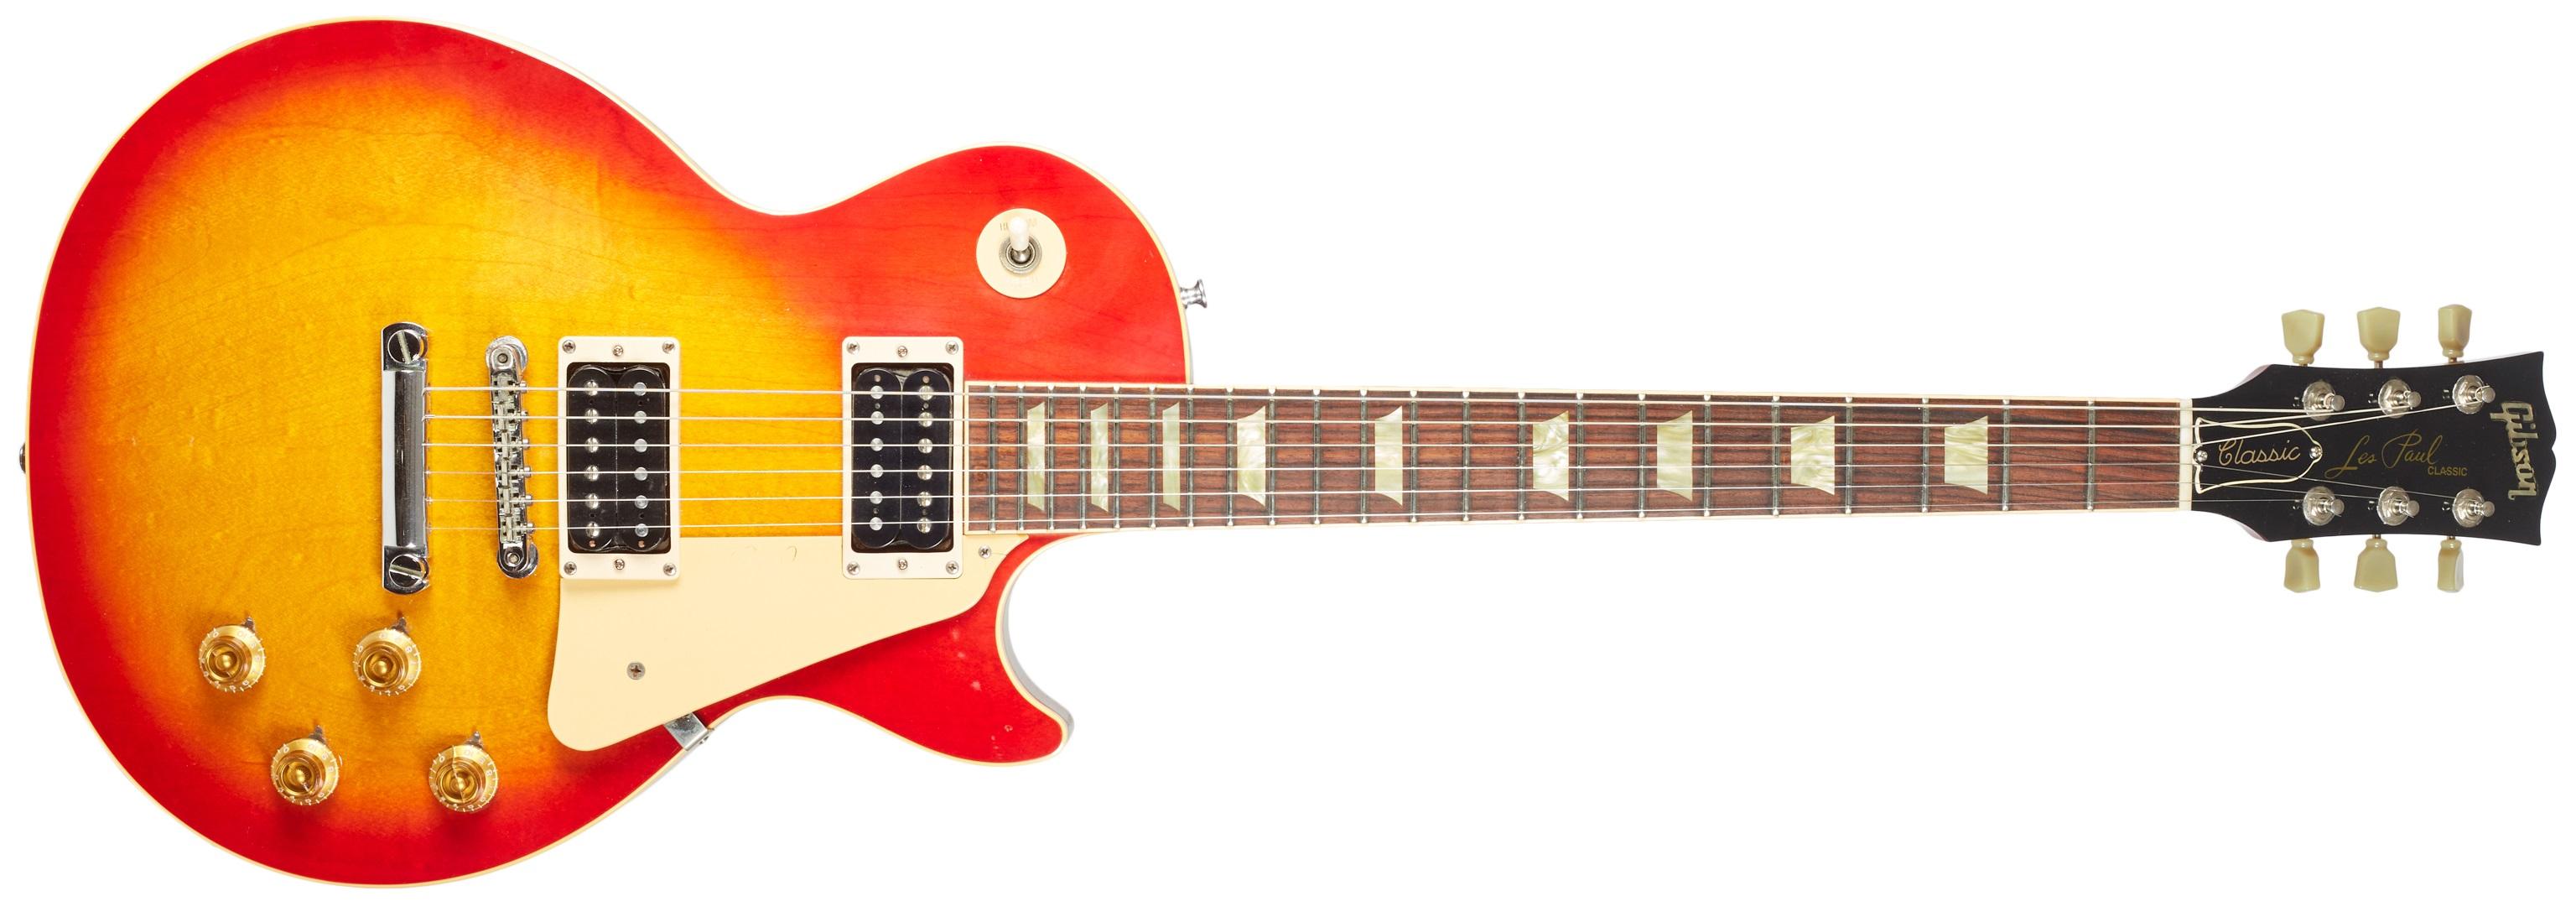 Gibson 1996 Les Paul Classic